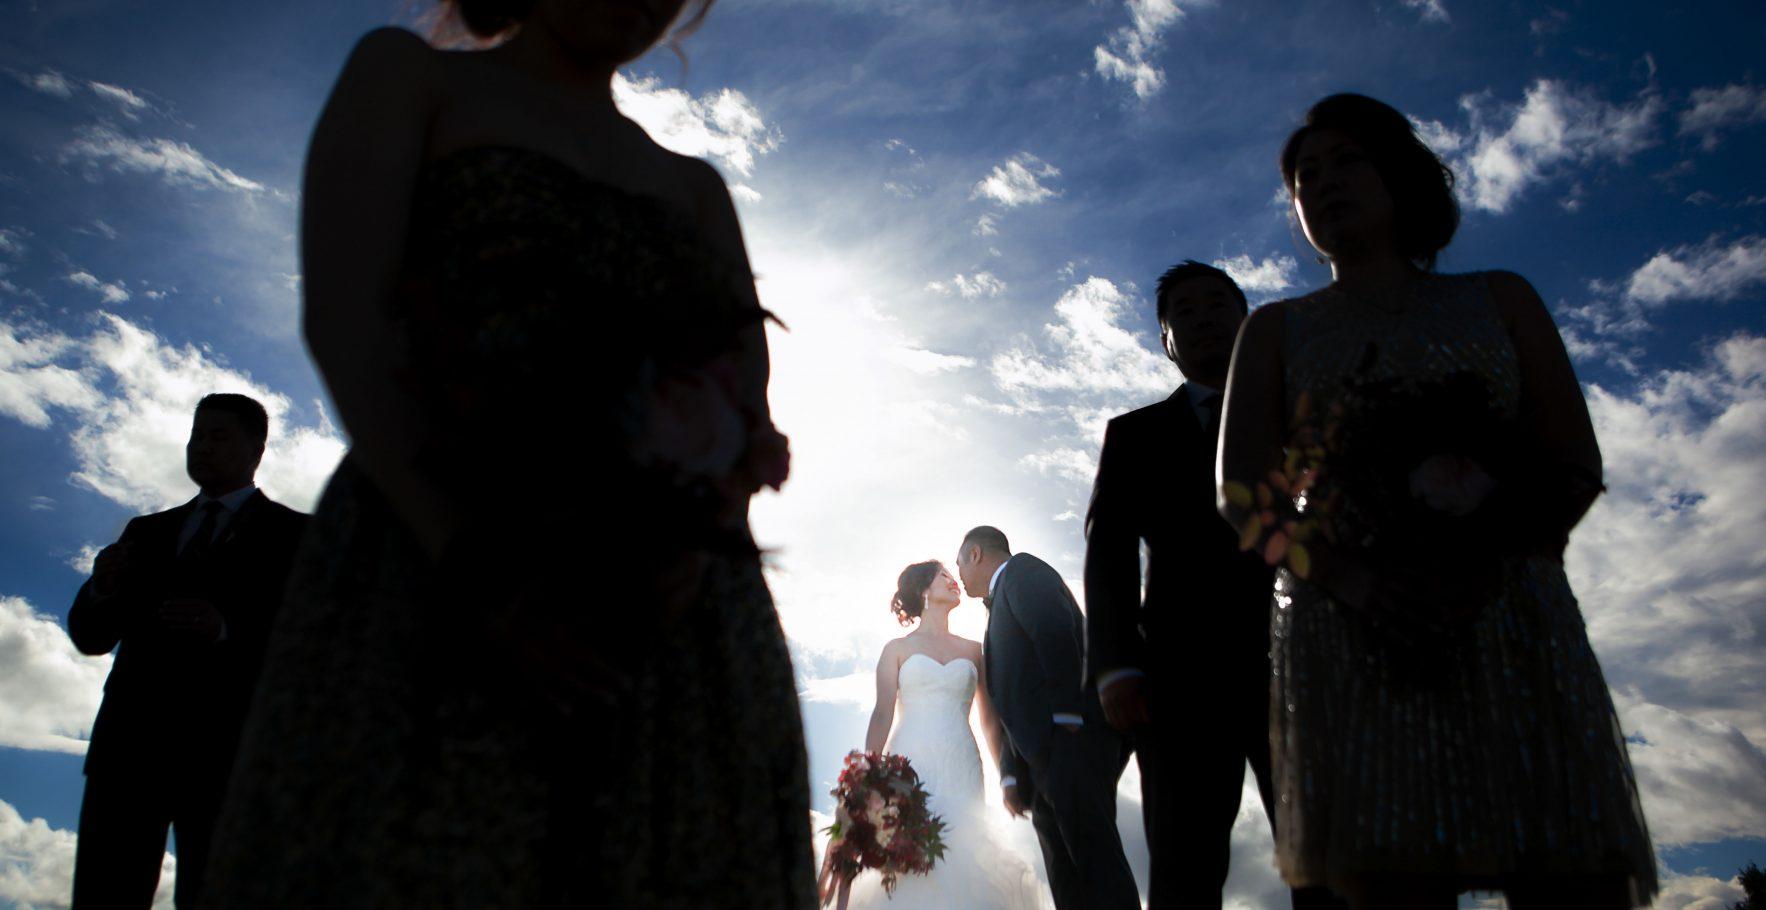 aa_bouquet-wedding-photographer-northwest_newcastle-golf_022